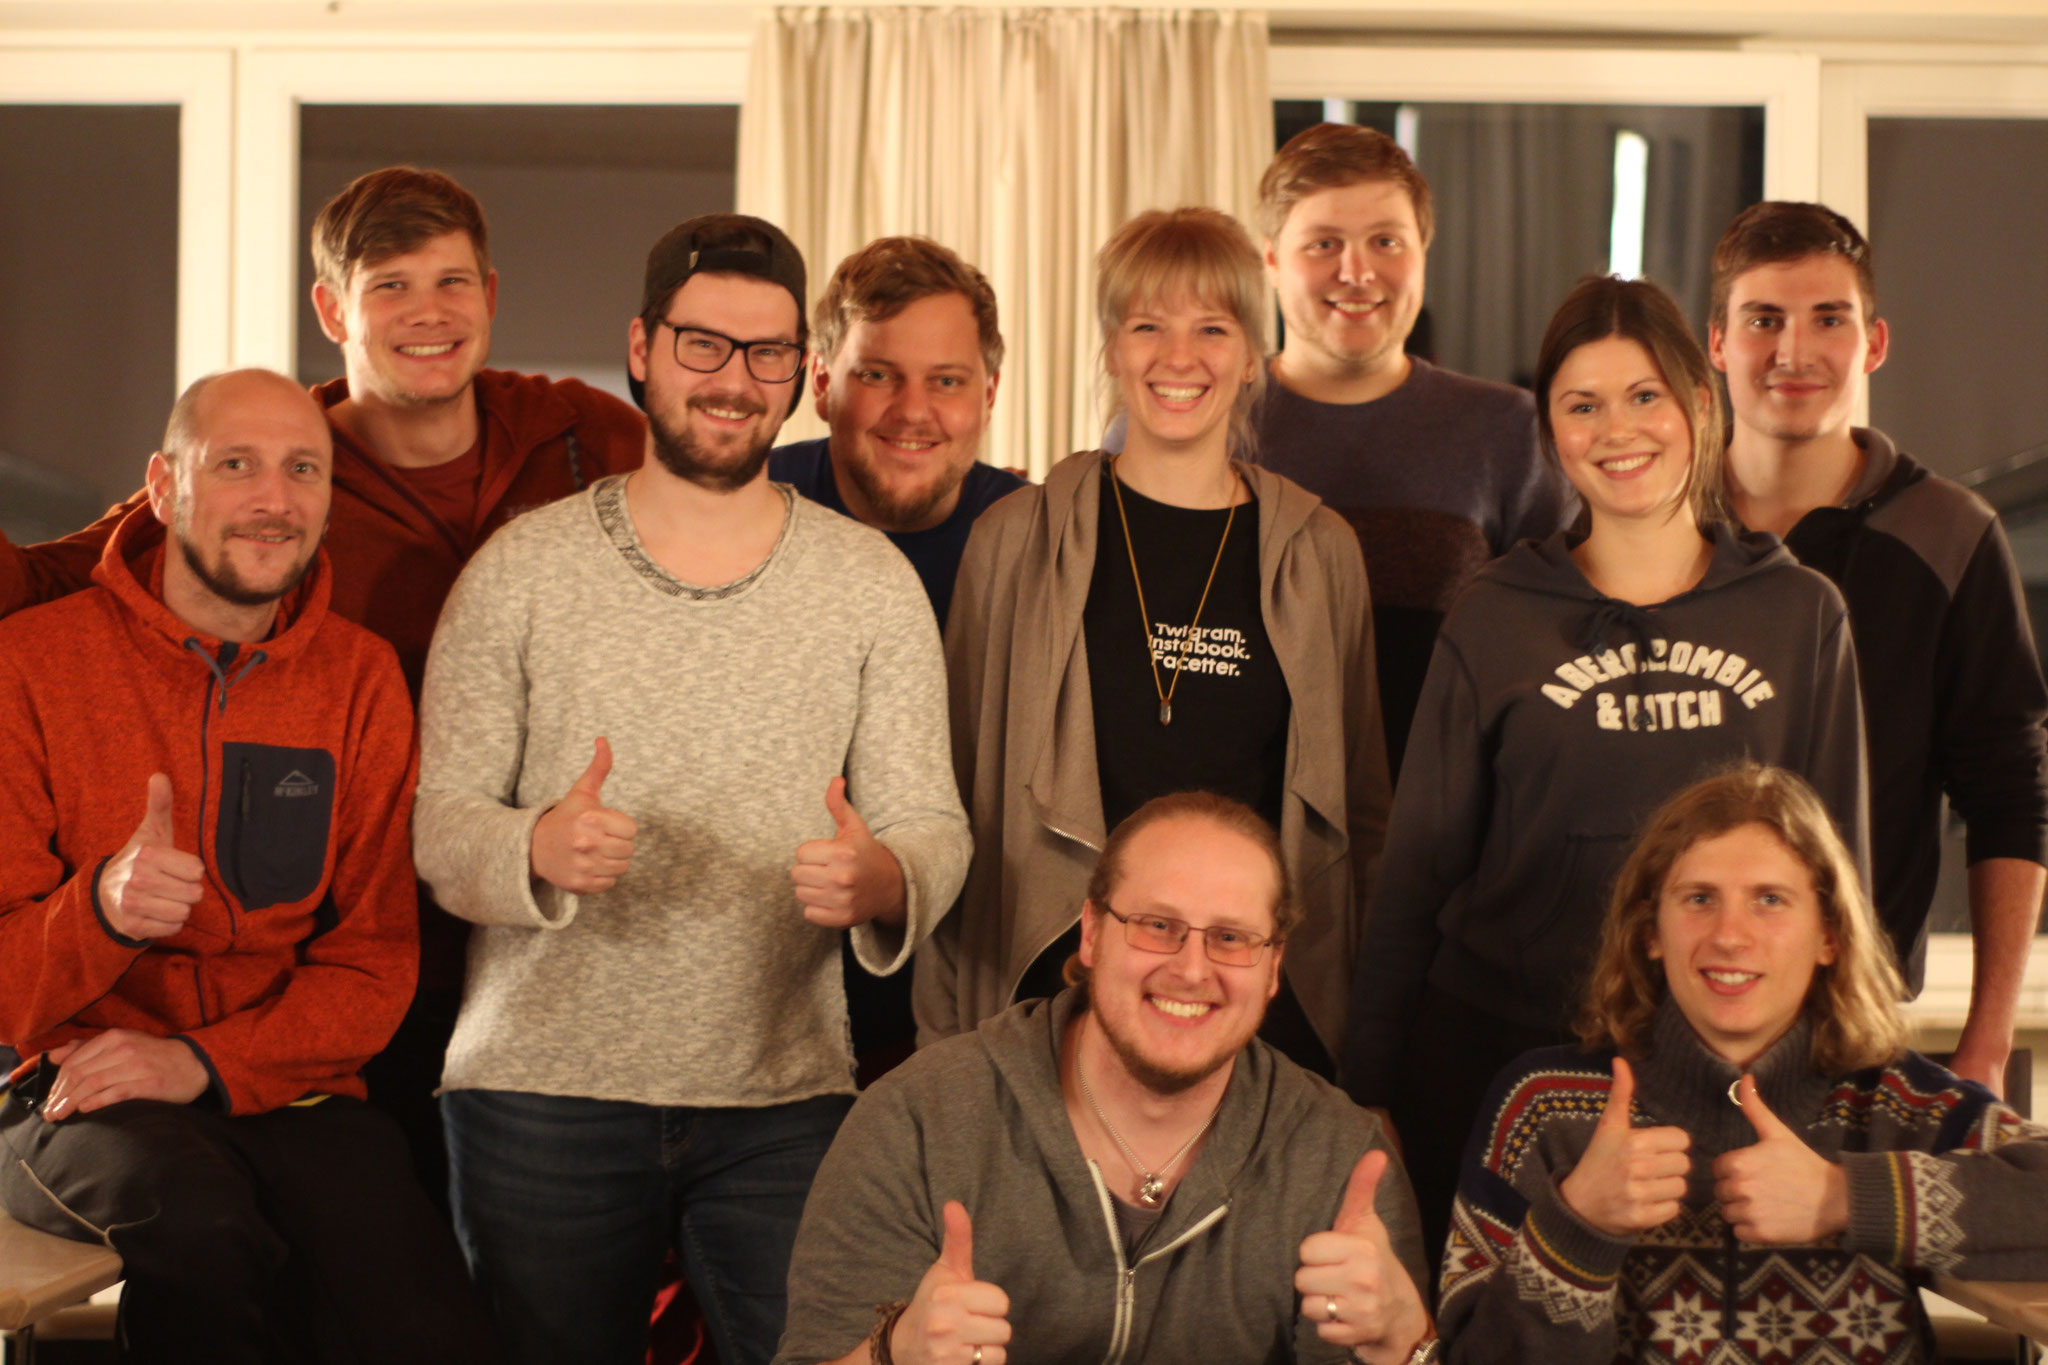 Teilnehmende des Outdoor-Kletter-Betreuer*in Kurses Februar 2019